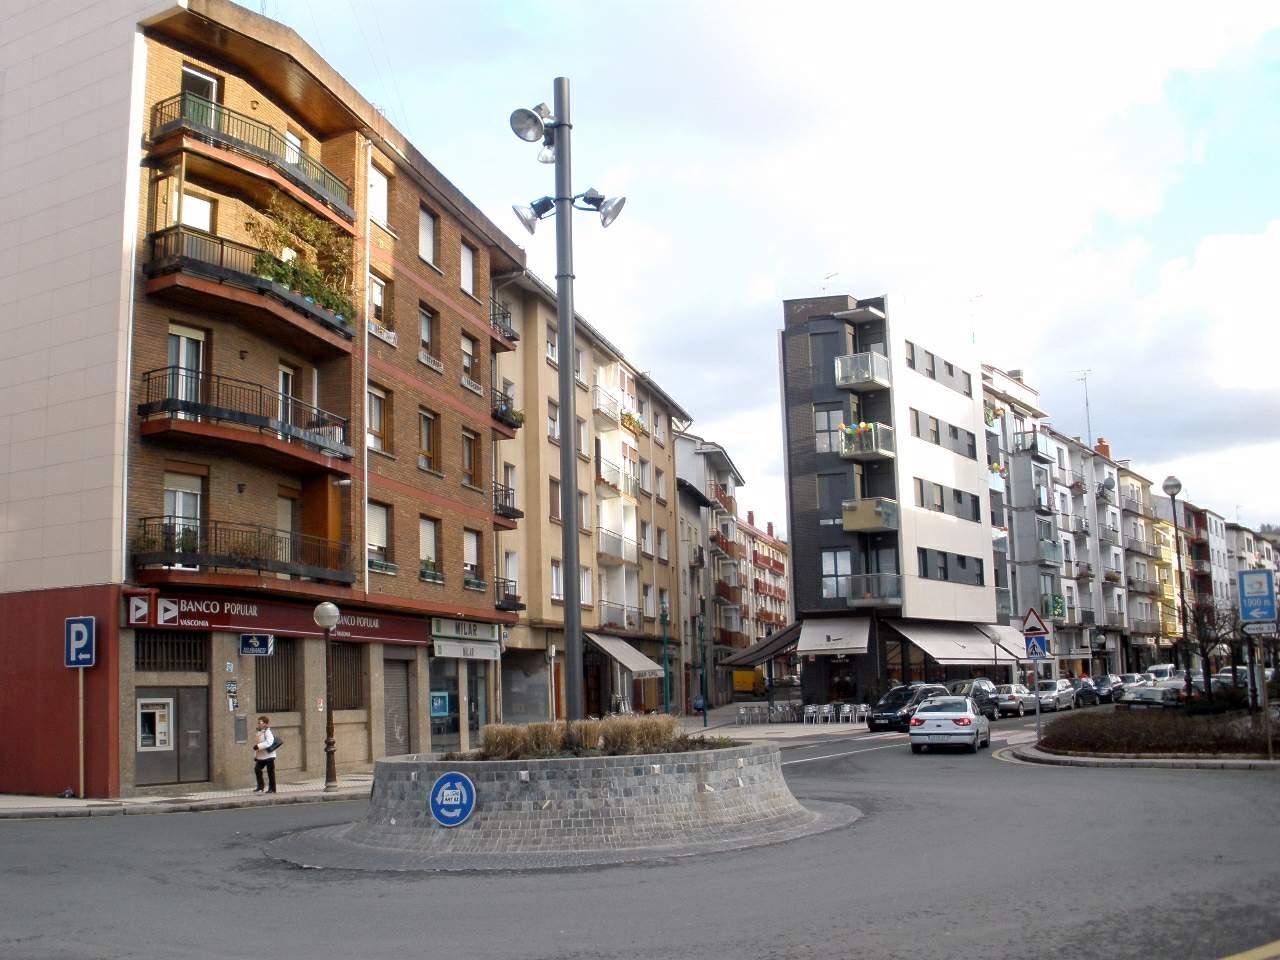 File:Lasarte-Oria 06.JPG - Wikimedia Commons